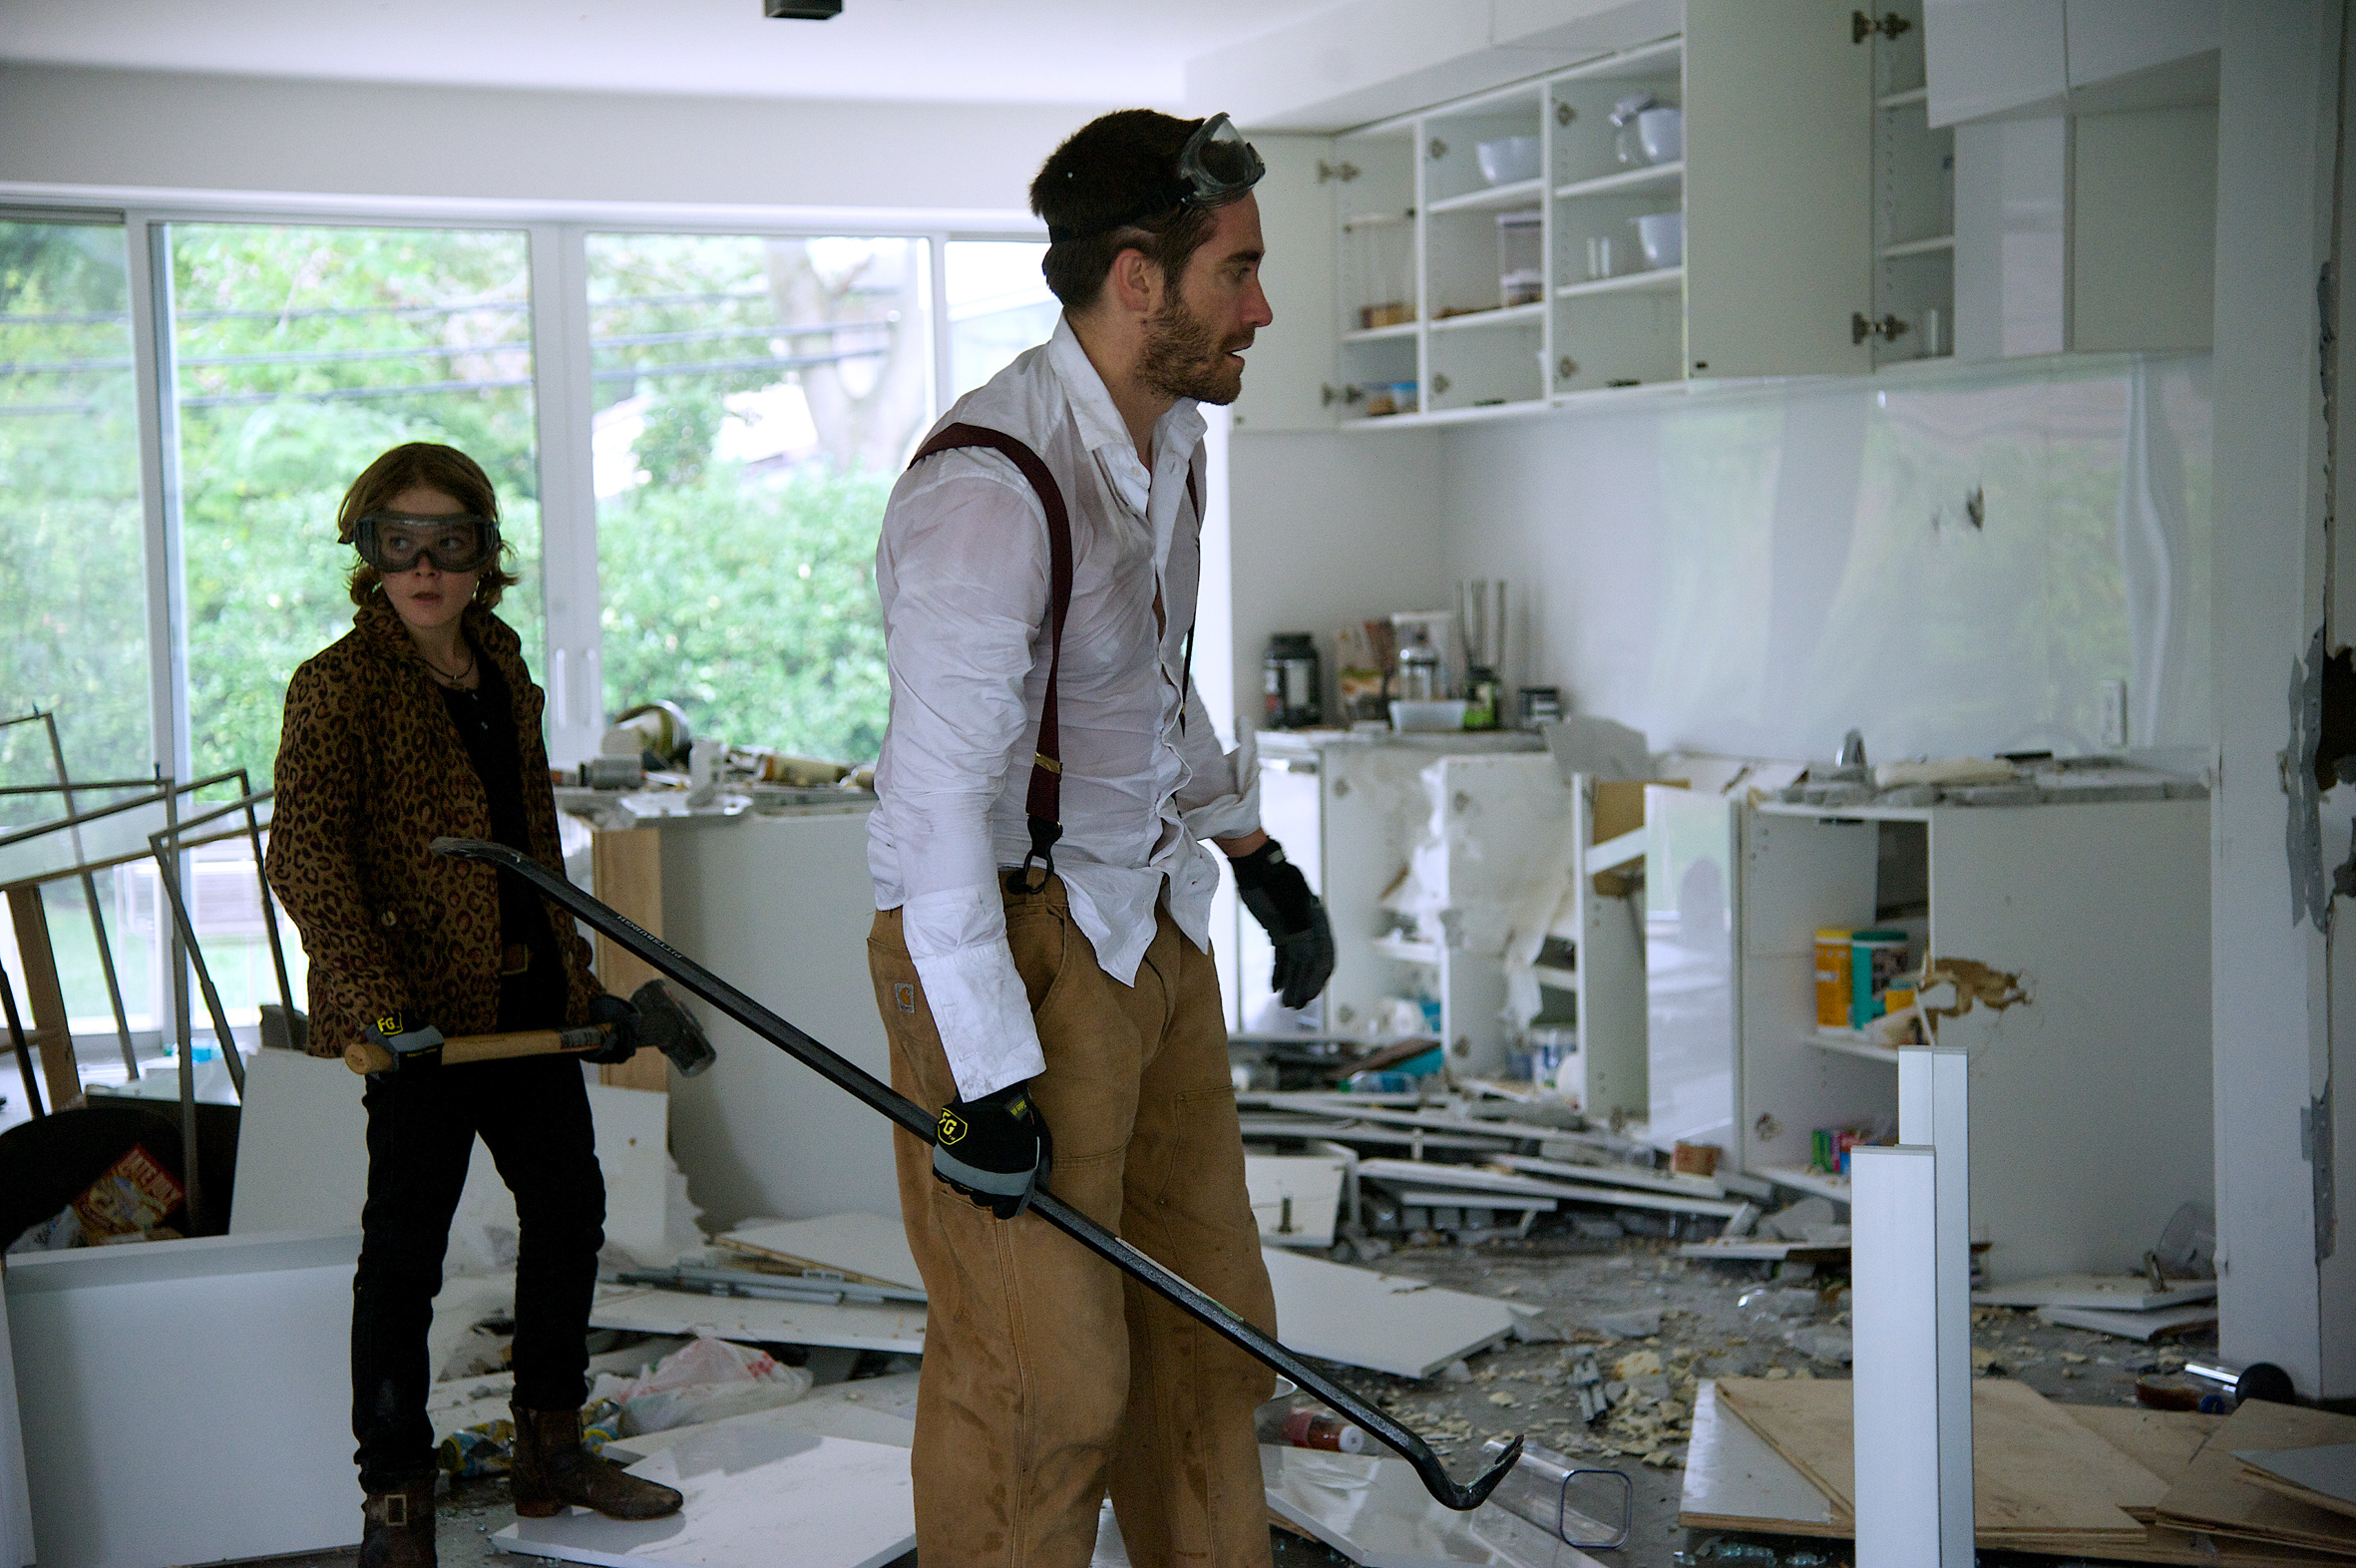 jomovie13 - Stills from the movie Demolition starring Jake Gyllenhaal, Naomi Watts, Judah Lewis##########jomovie13##########CATHEY-KERIS FILMS